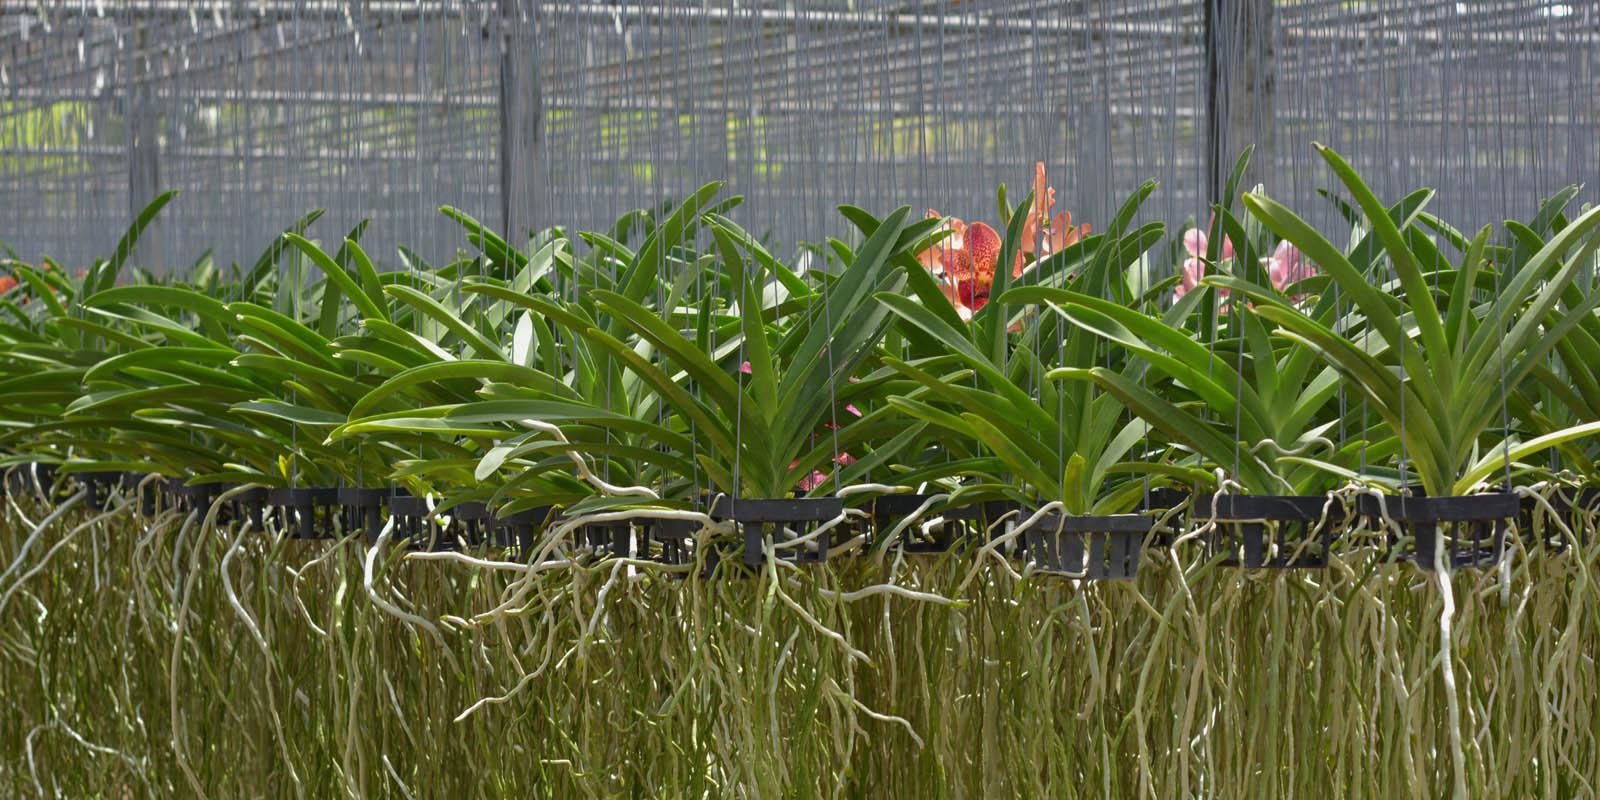 Vanda Blooming Size is on now